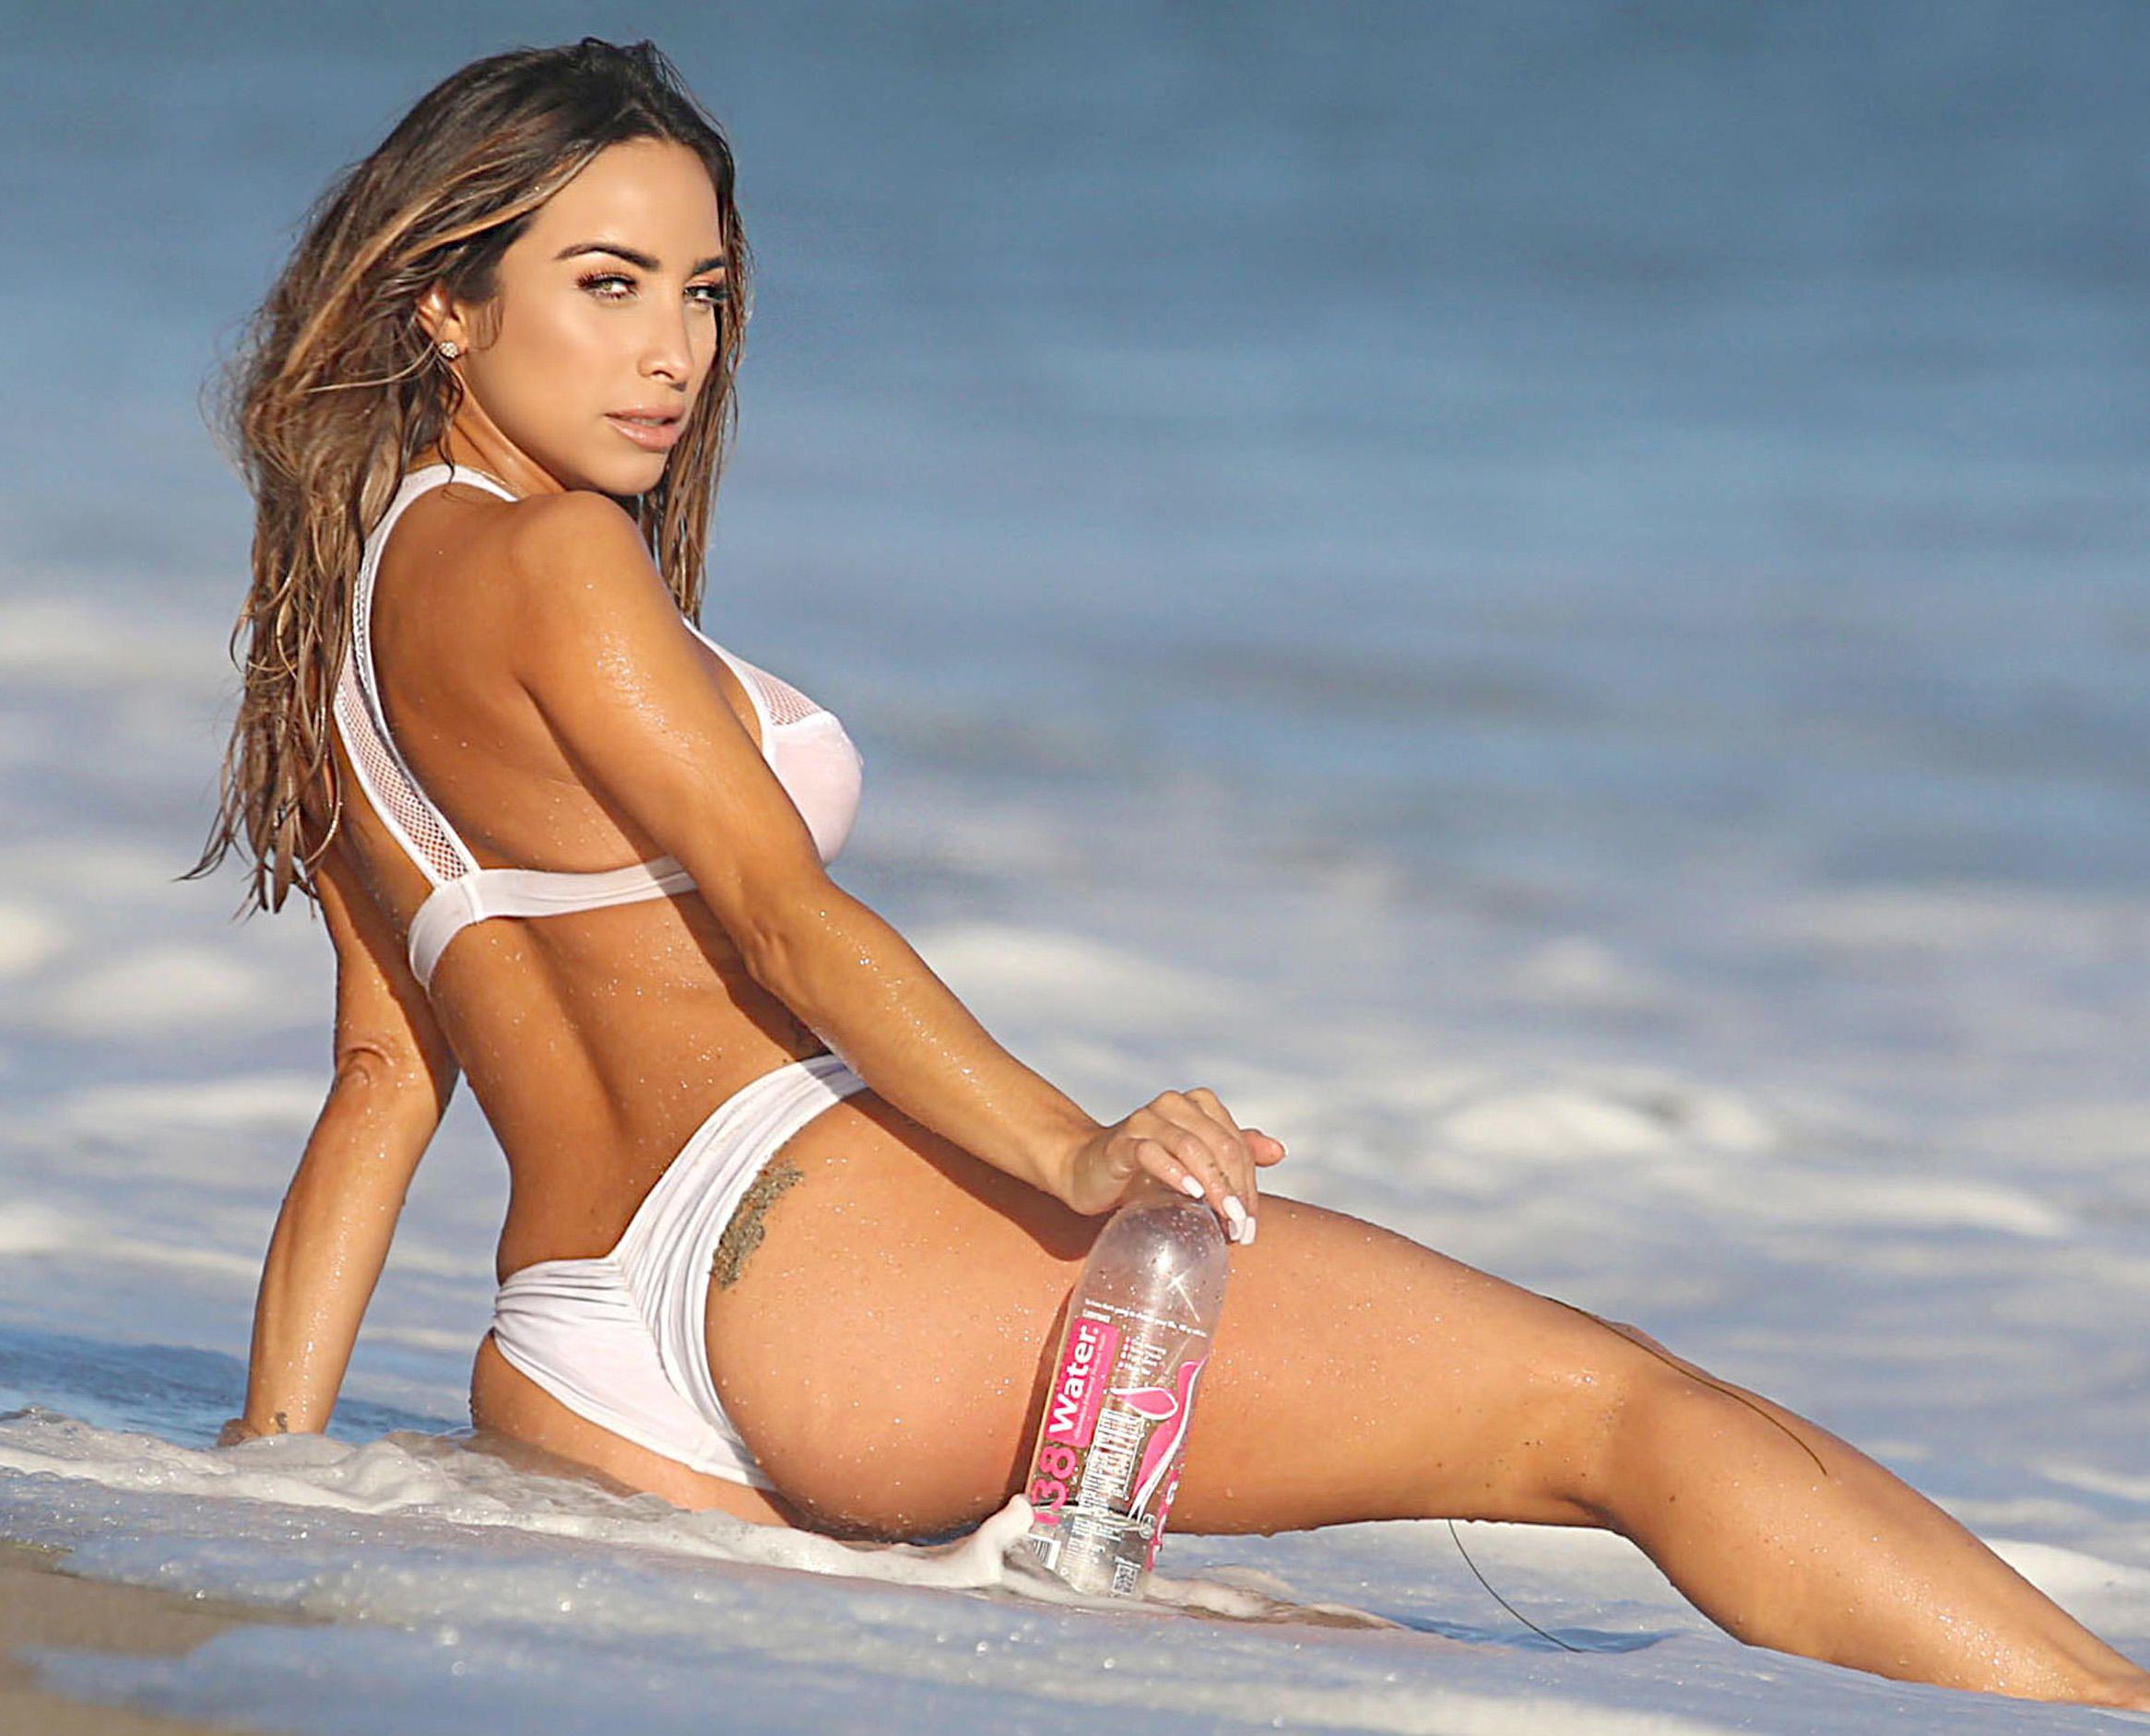 Yesenia-Bustillo-Bikini-3